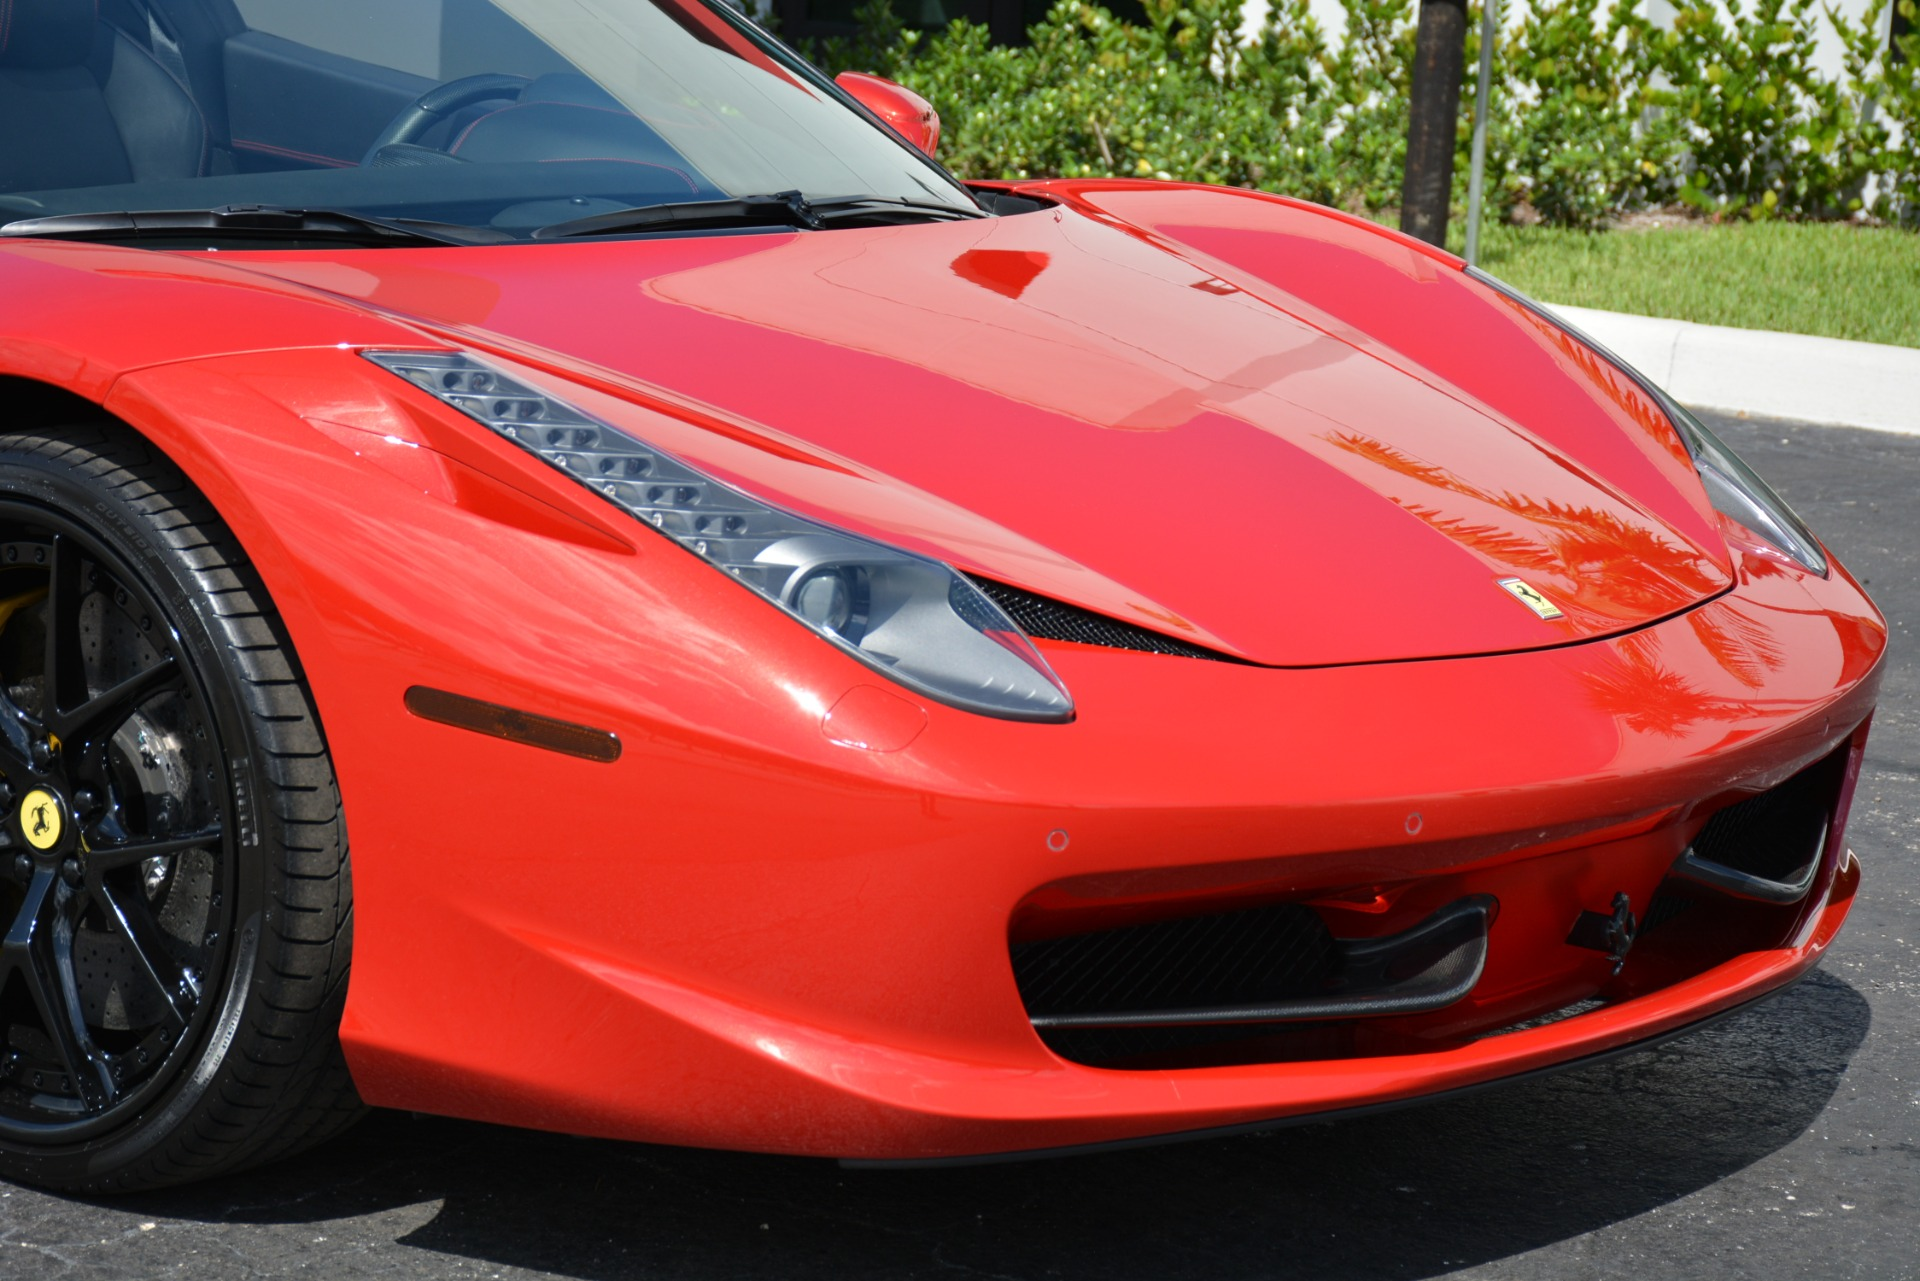 Used 2015 Ferrari 458 Spider For Sale 224 900 Marino